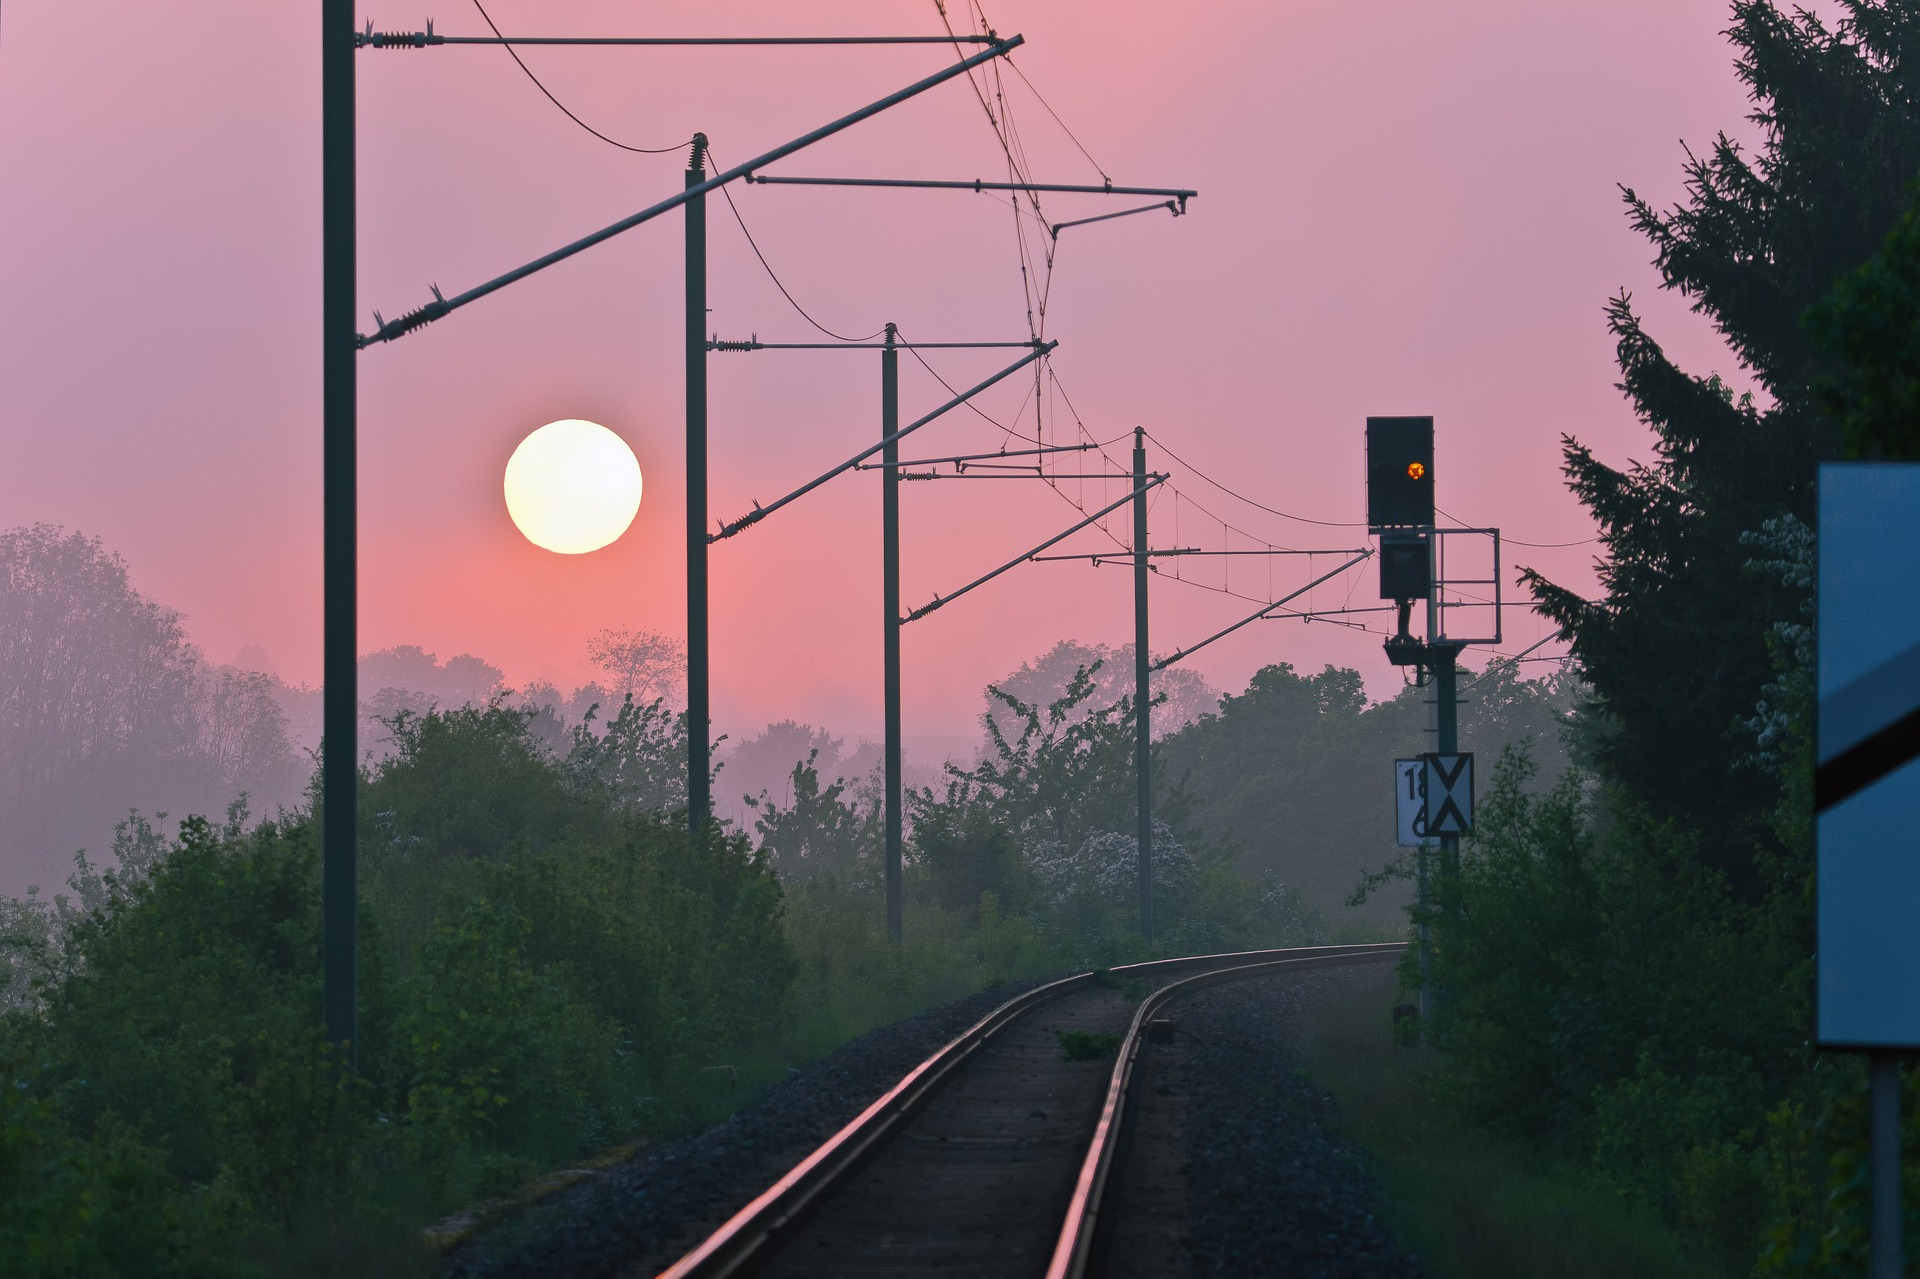 sunset-2147018_1920